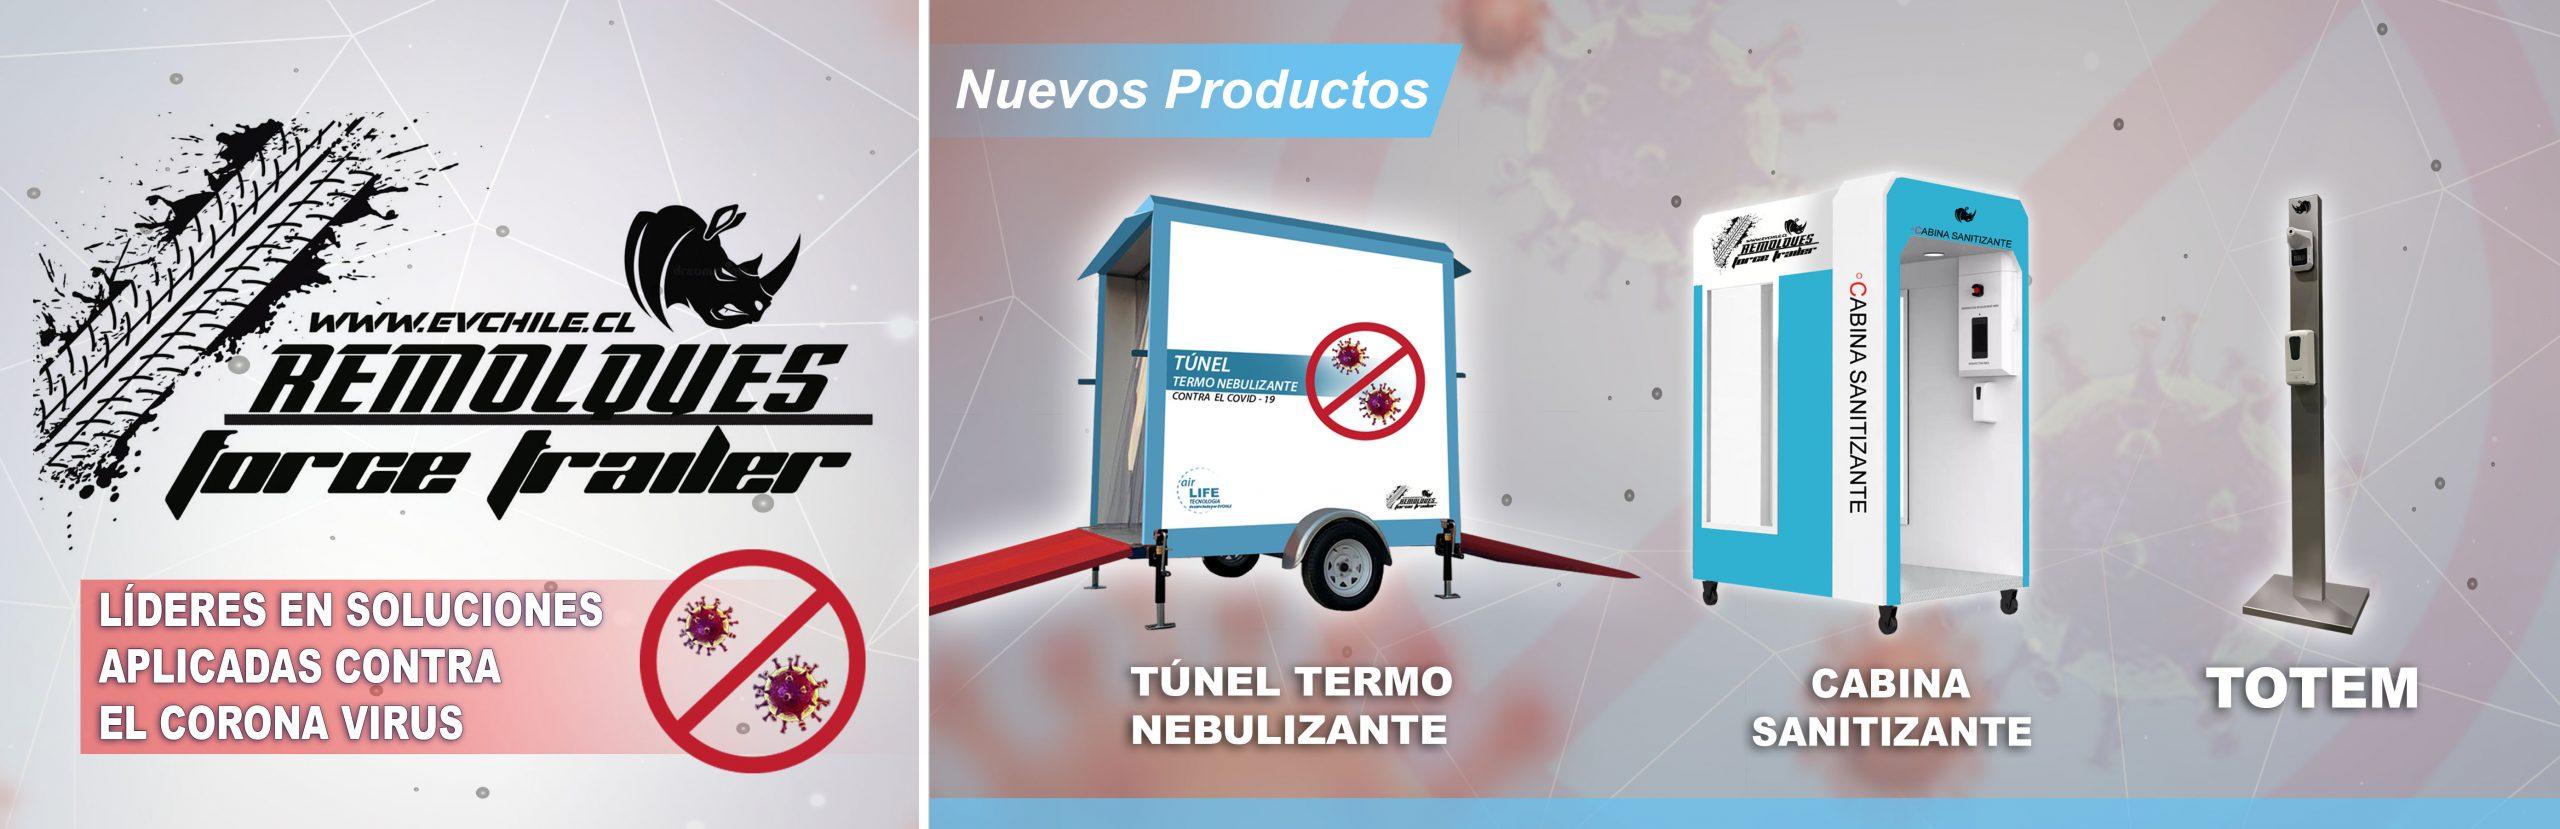 Empresas Vergara Chile